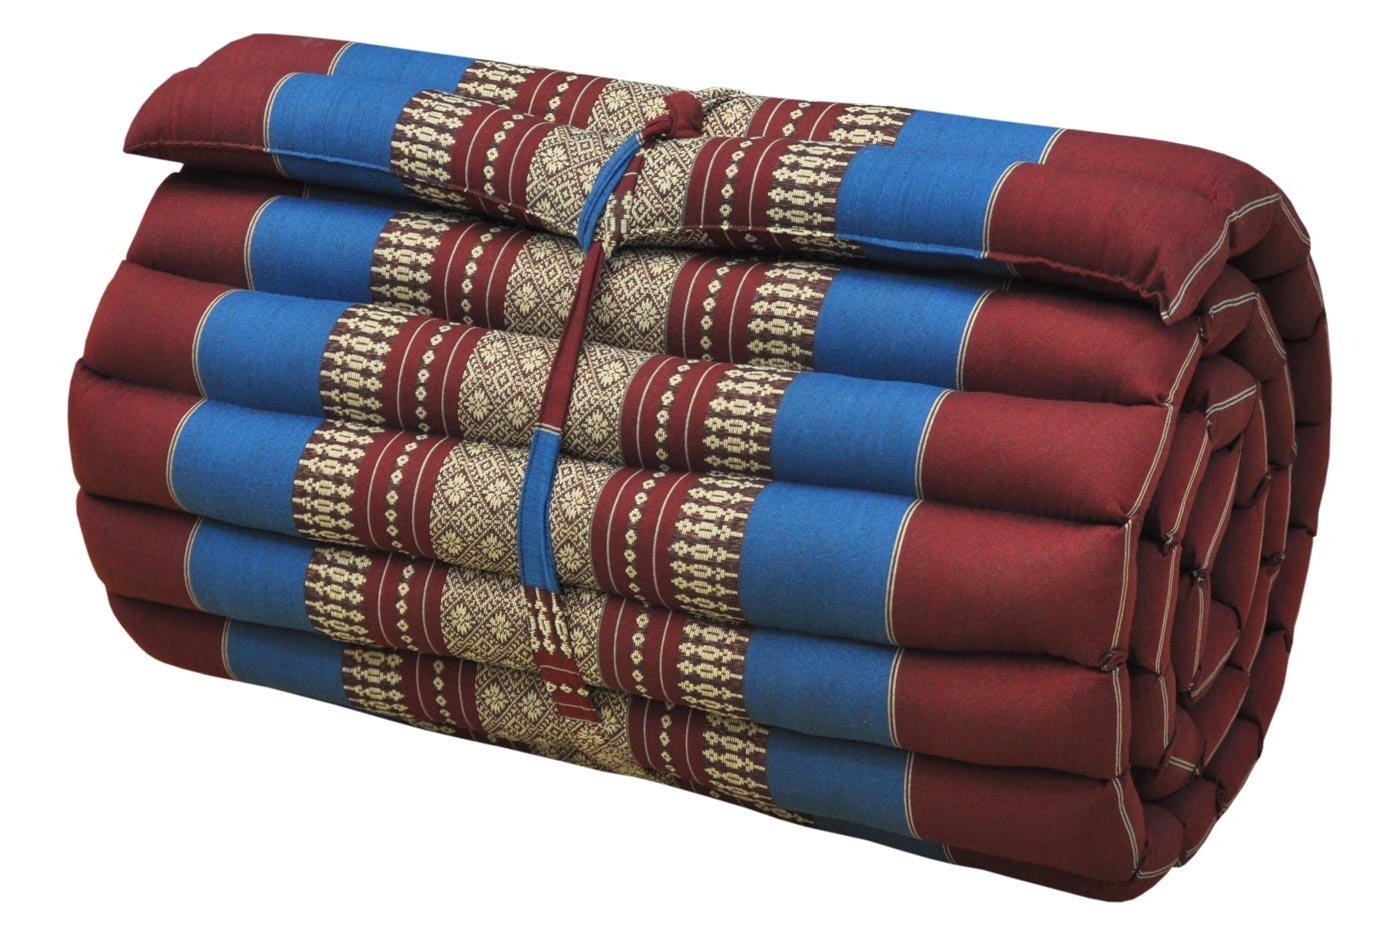 Thai mattress small size (55/180), red/blue, relaxation, beach cushion, pool, meditation, yoga (81213)